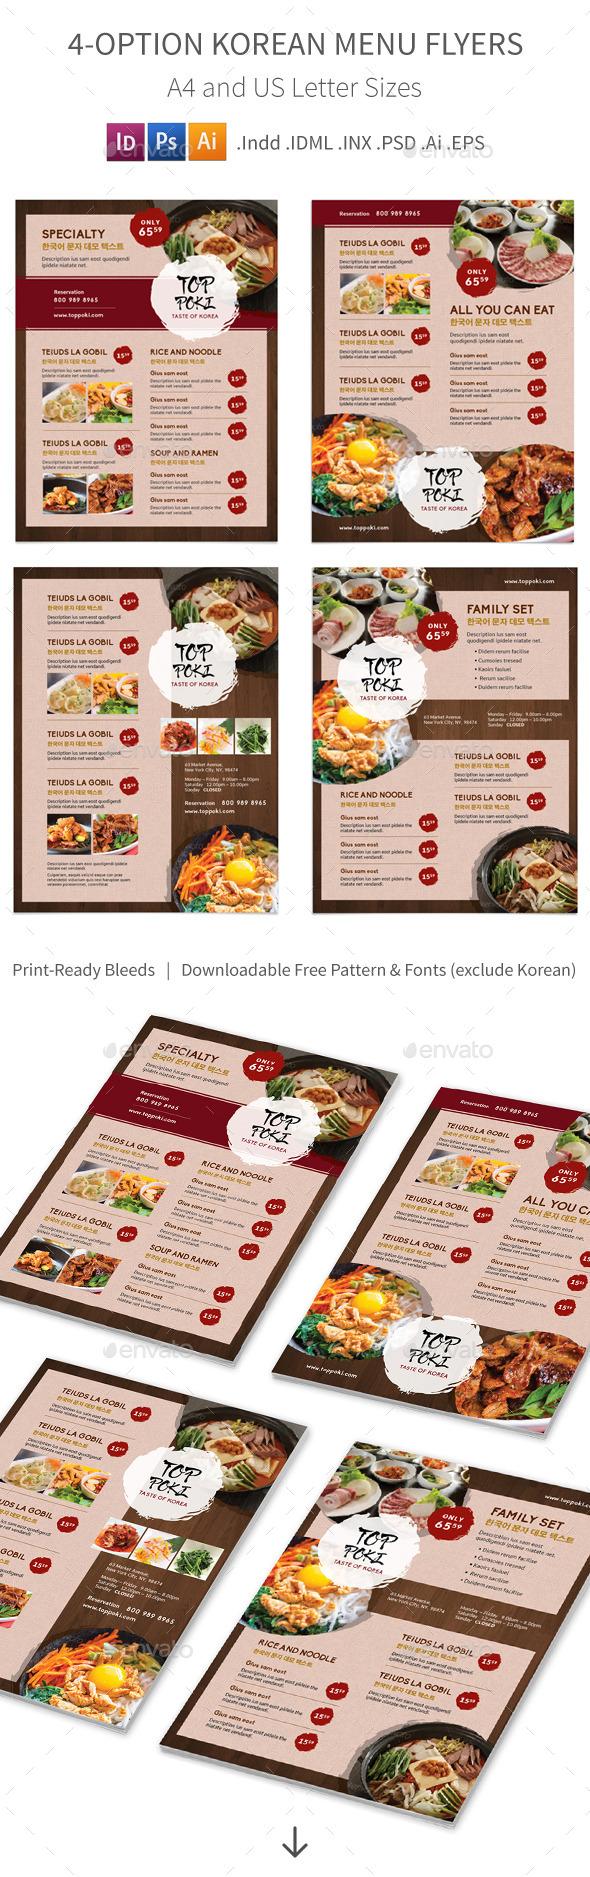 Korean Restaurant Menu Flyers – 4 Options - Food Menus Print Templates